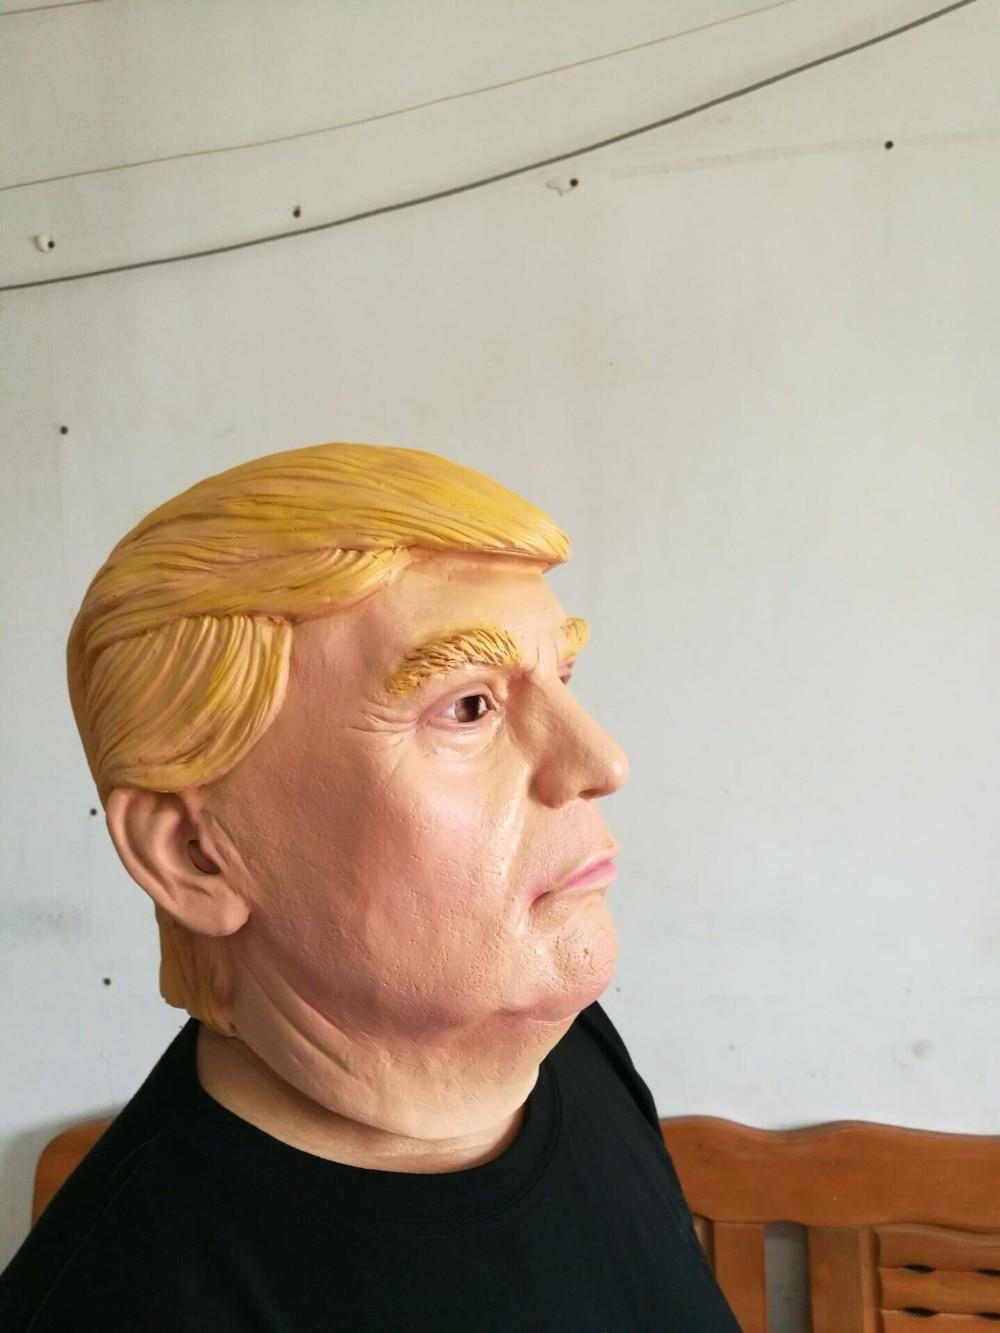 Aliexpress.com : Buy Lifelike Donald Trump Mask Billionaire ...